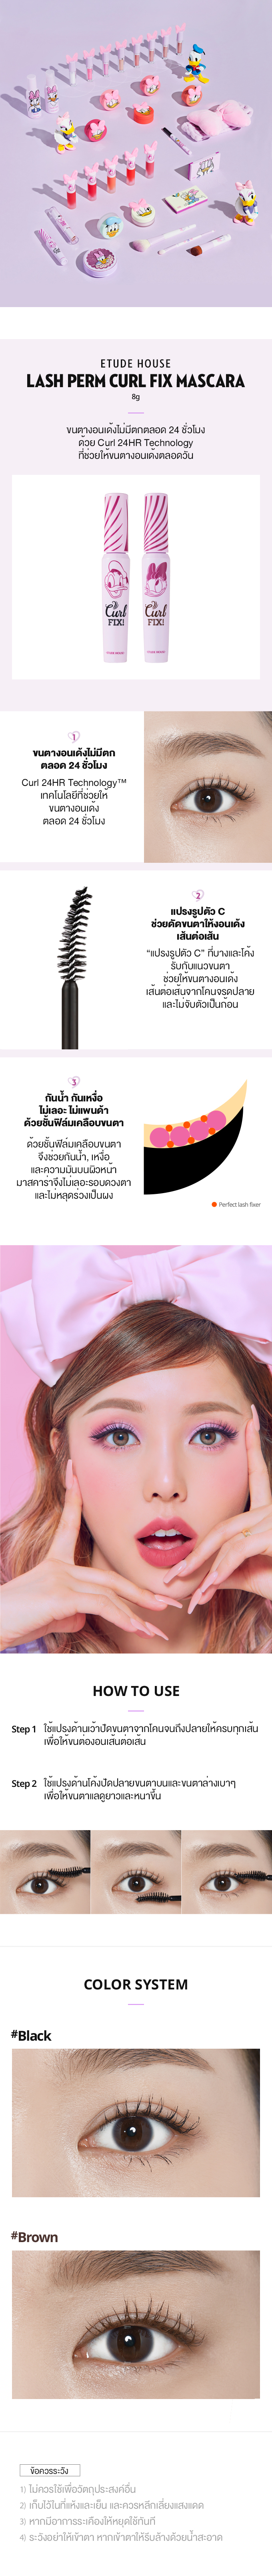 TH1_(Daisy Duck) Lash Perm Curl Fix Mascara